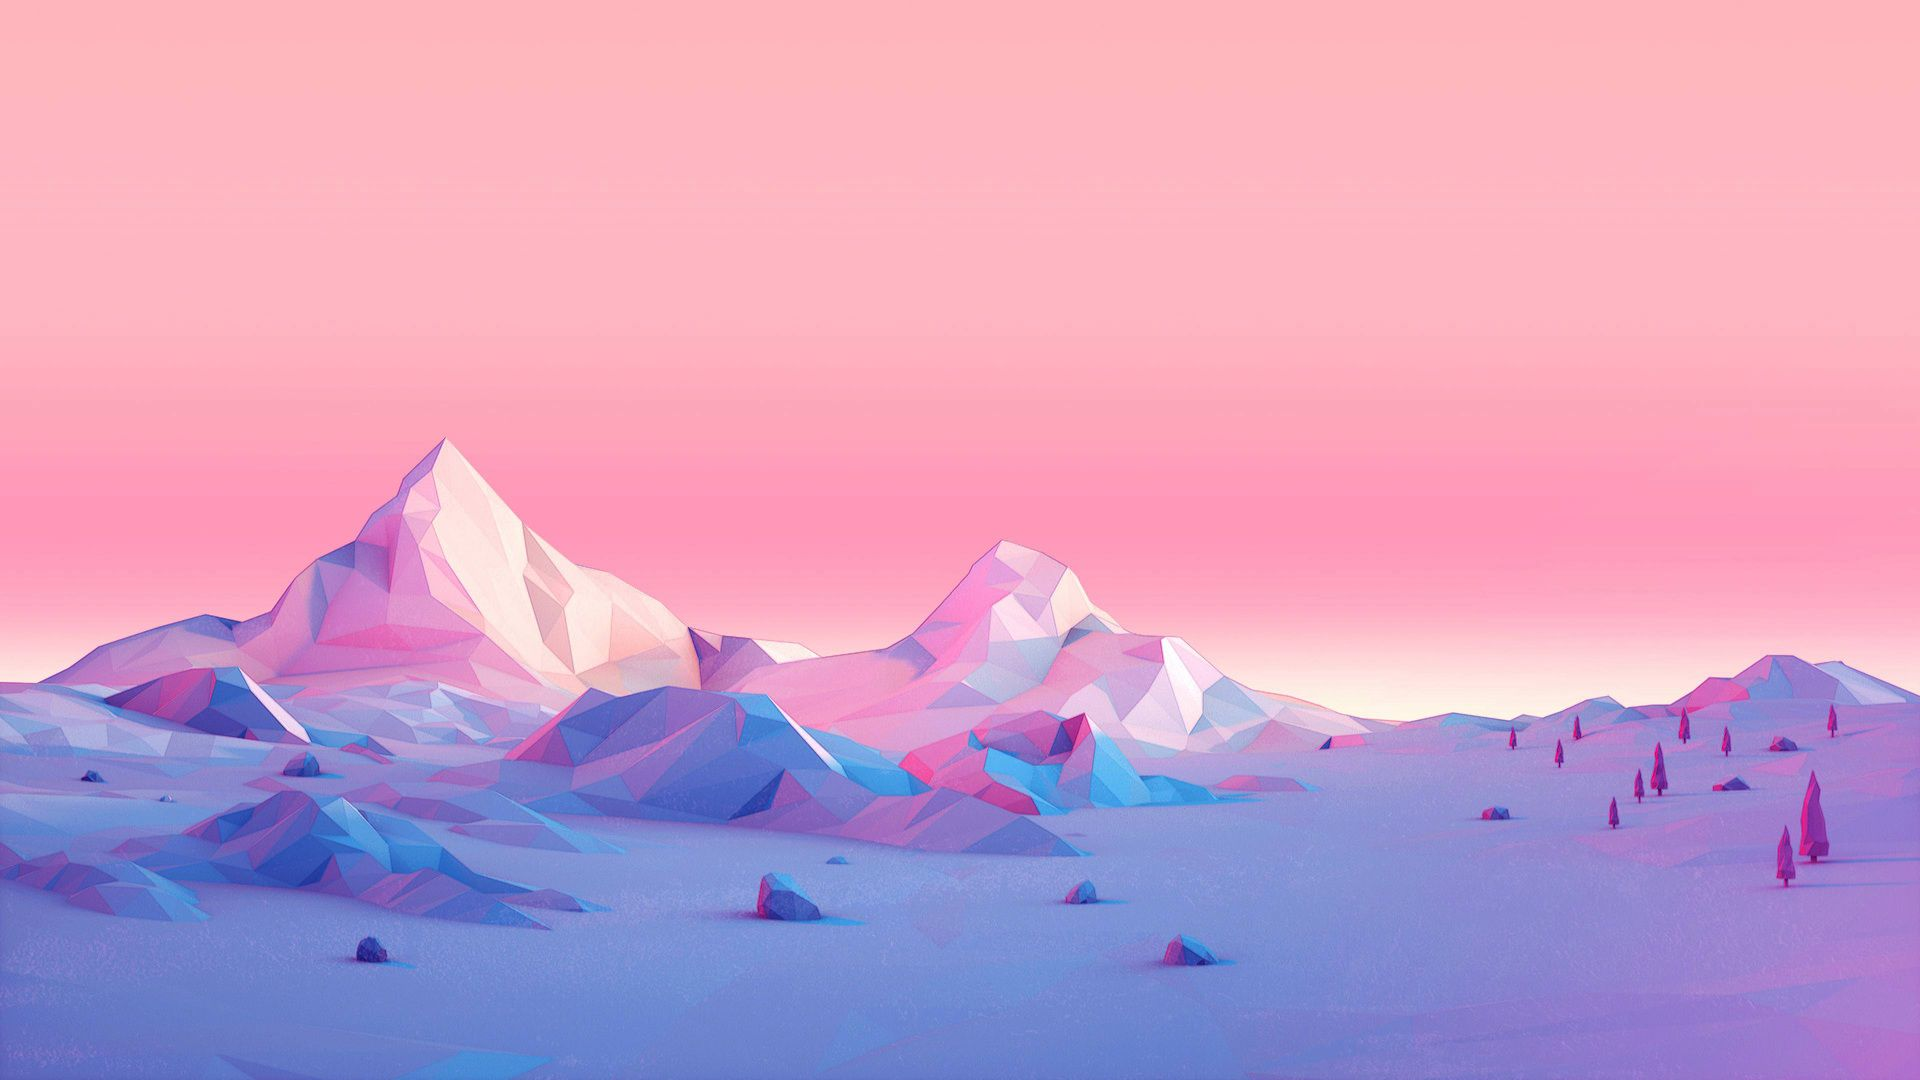 Minimalist Laptop Wallpapers Top Free Minimalist Laptop Backgrounds Wallpaperaccess